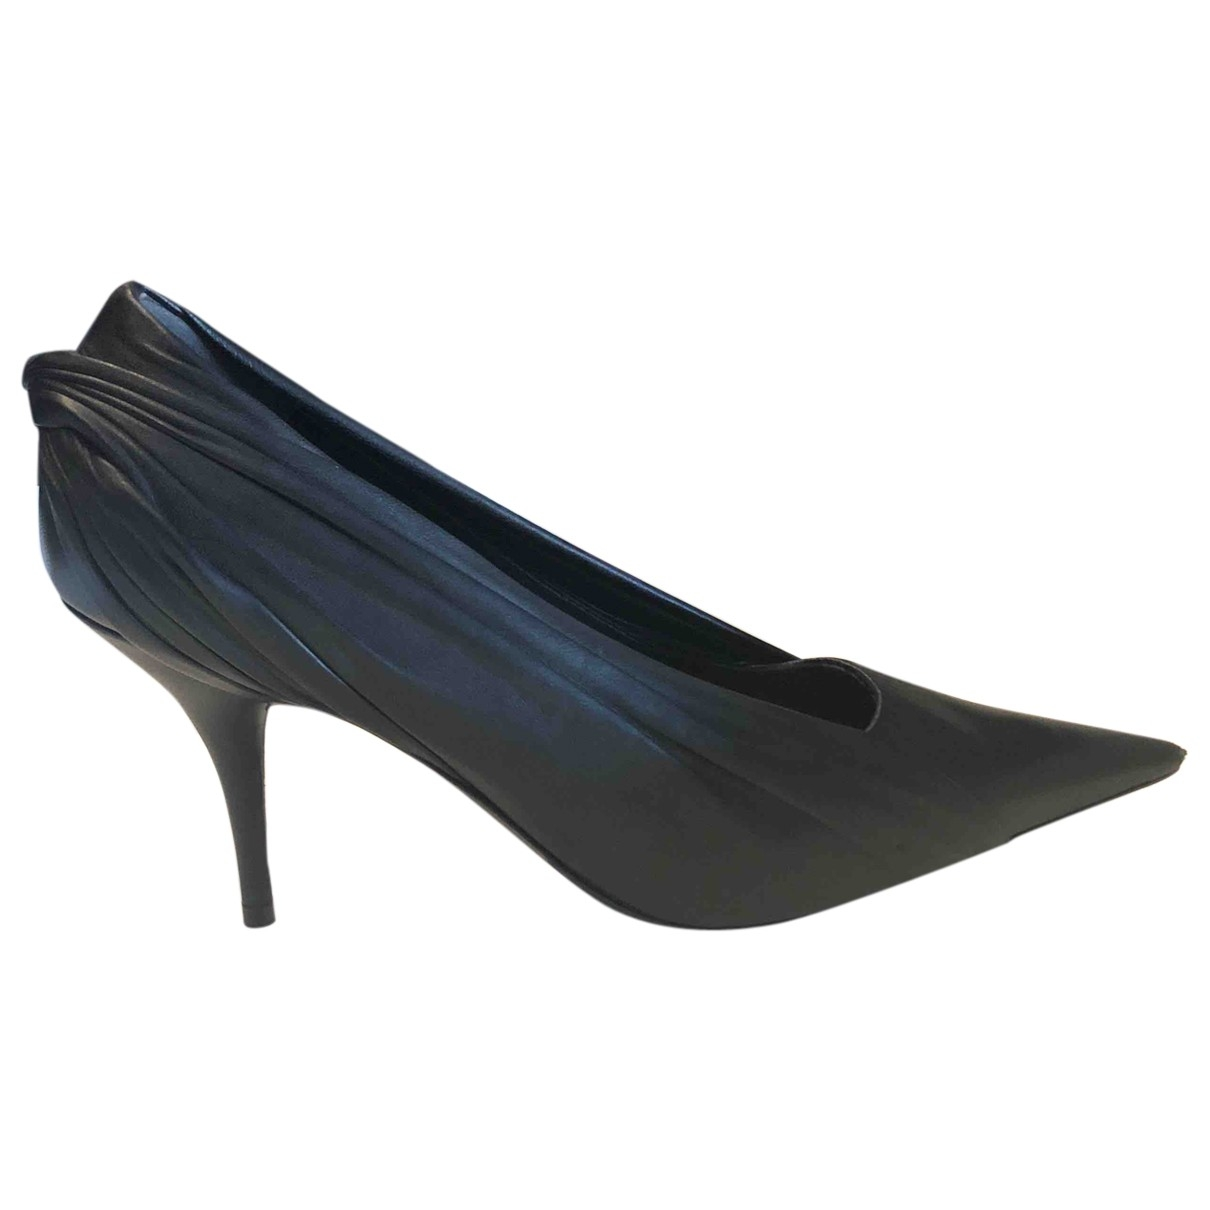 Balenciaga \N Black Leather Heels for Women 38 EU